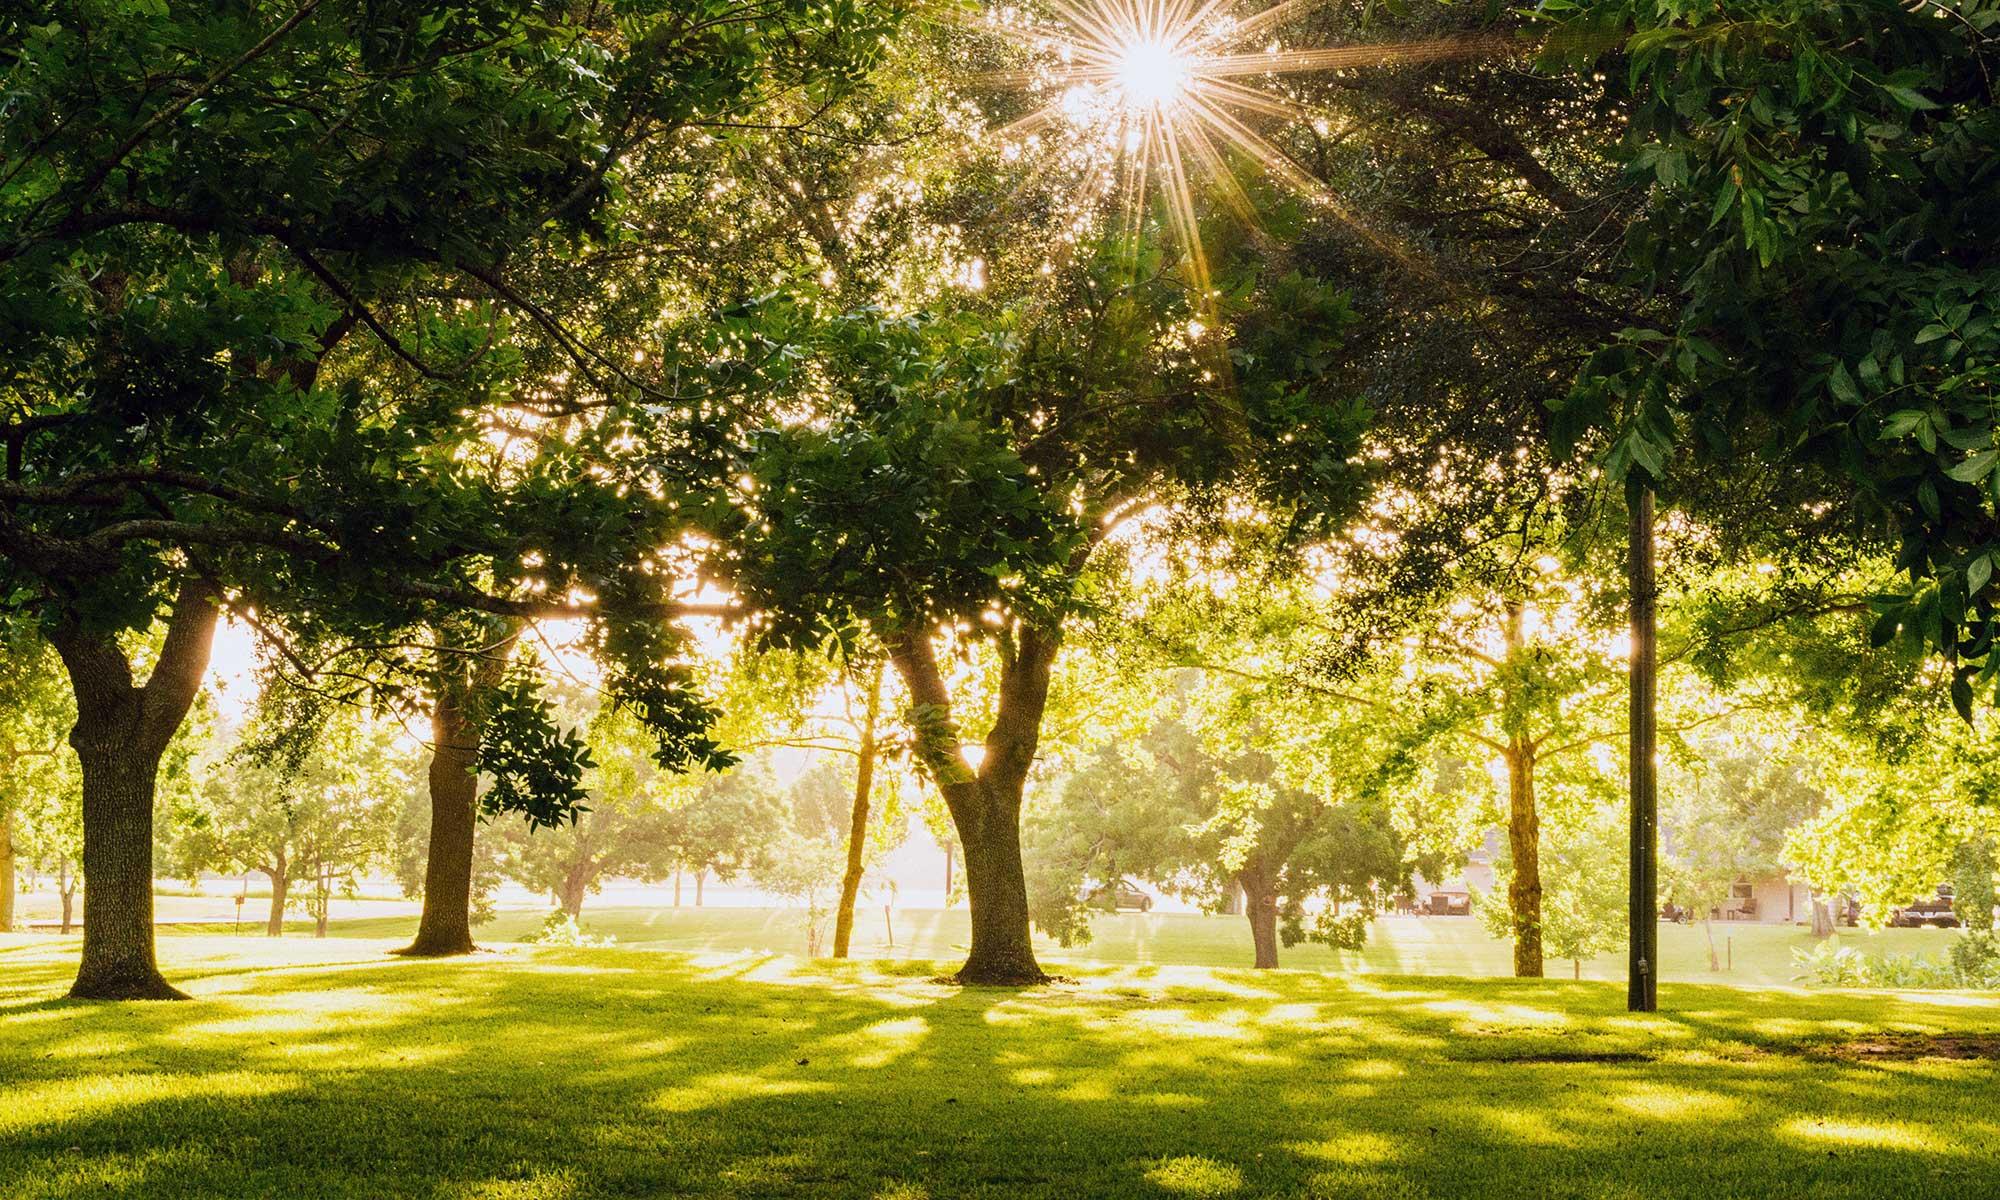 Sunlight In Trees At Park